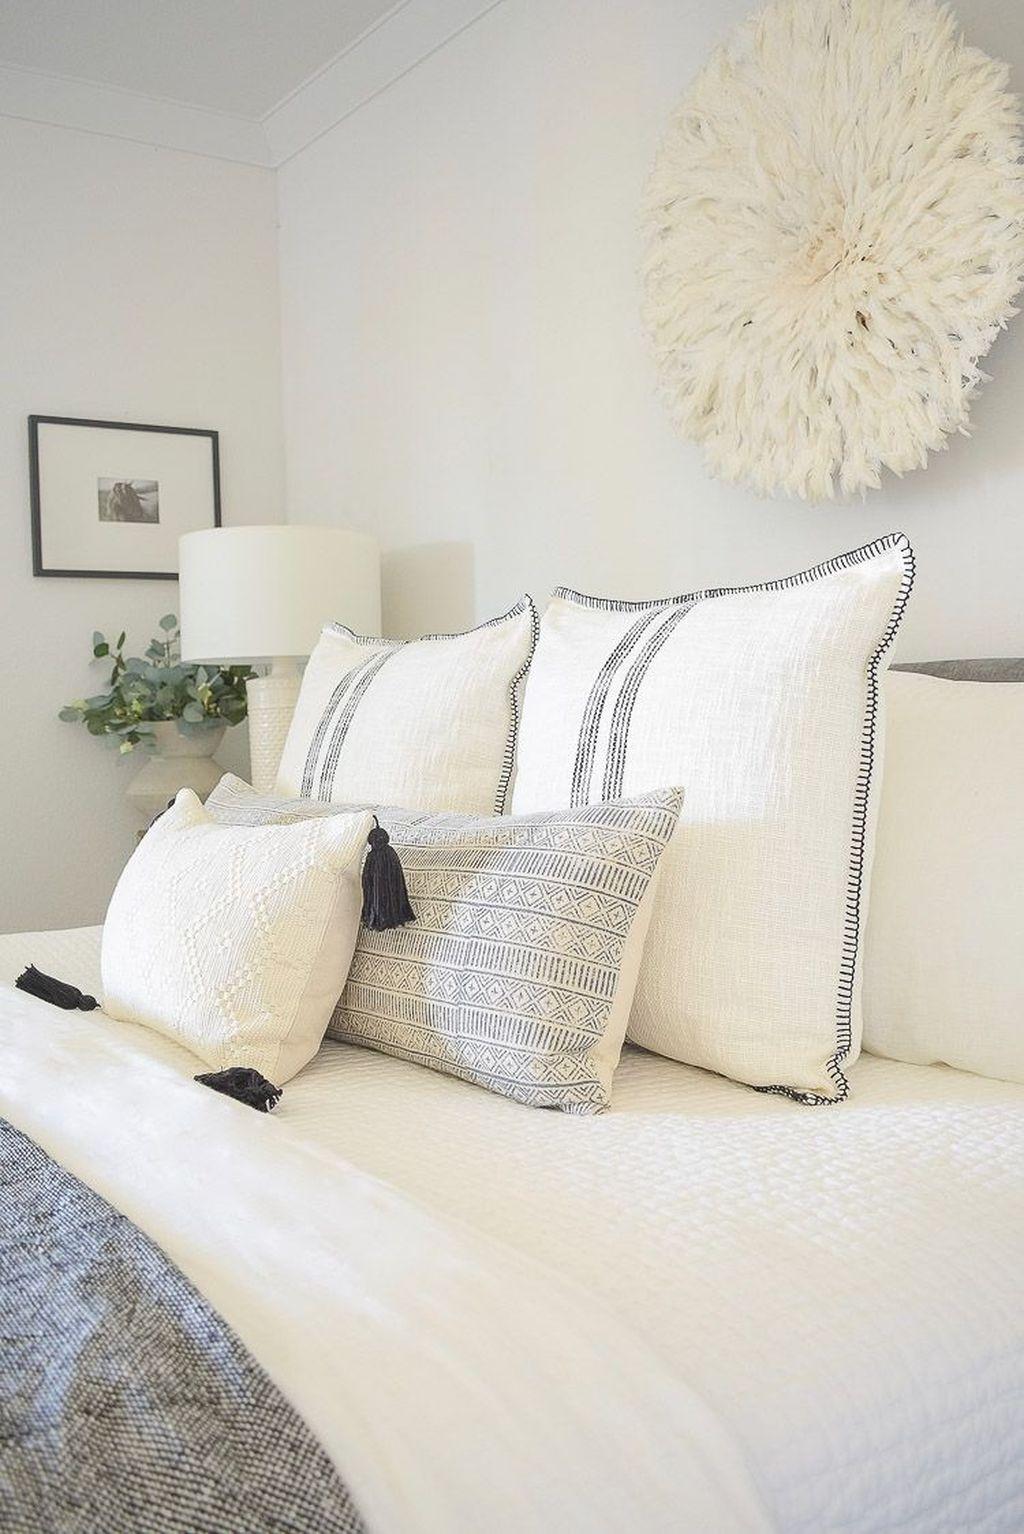 Lovely Spring Bedroom Decor Ideas Trending This Year 14